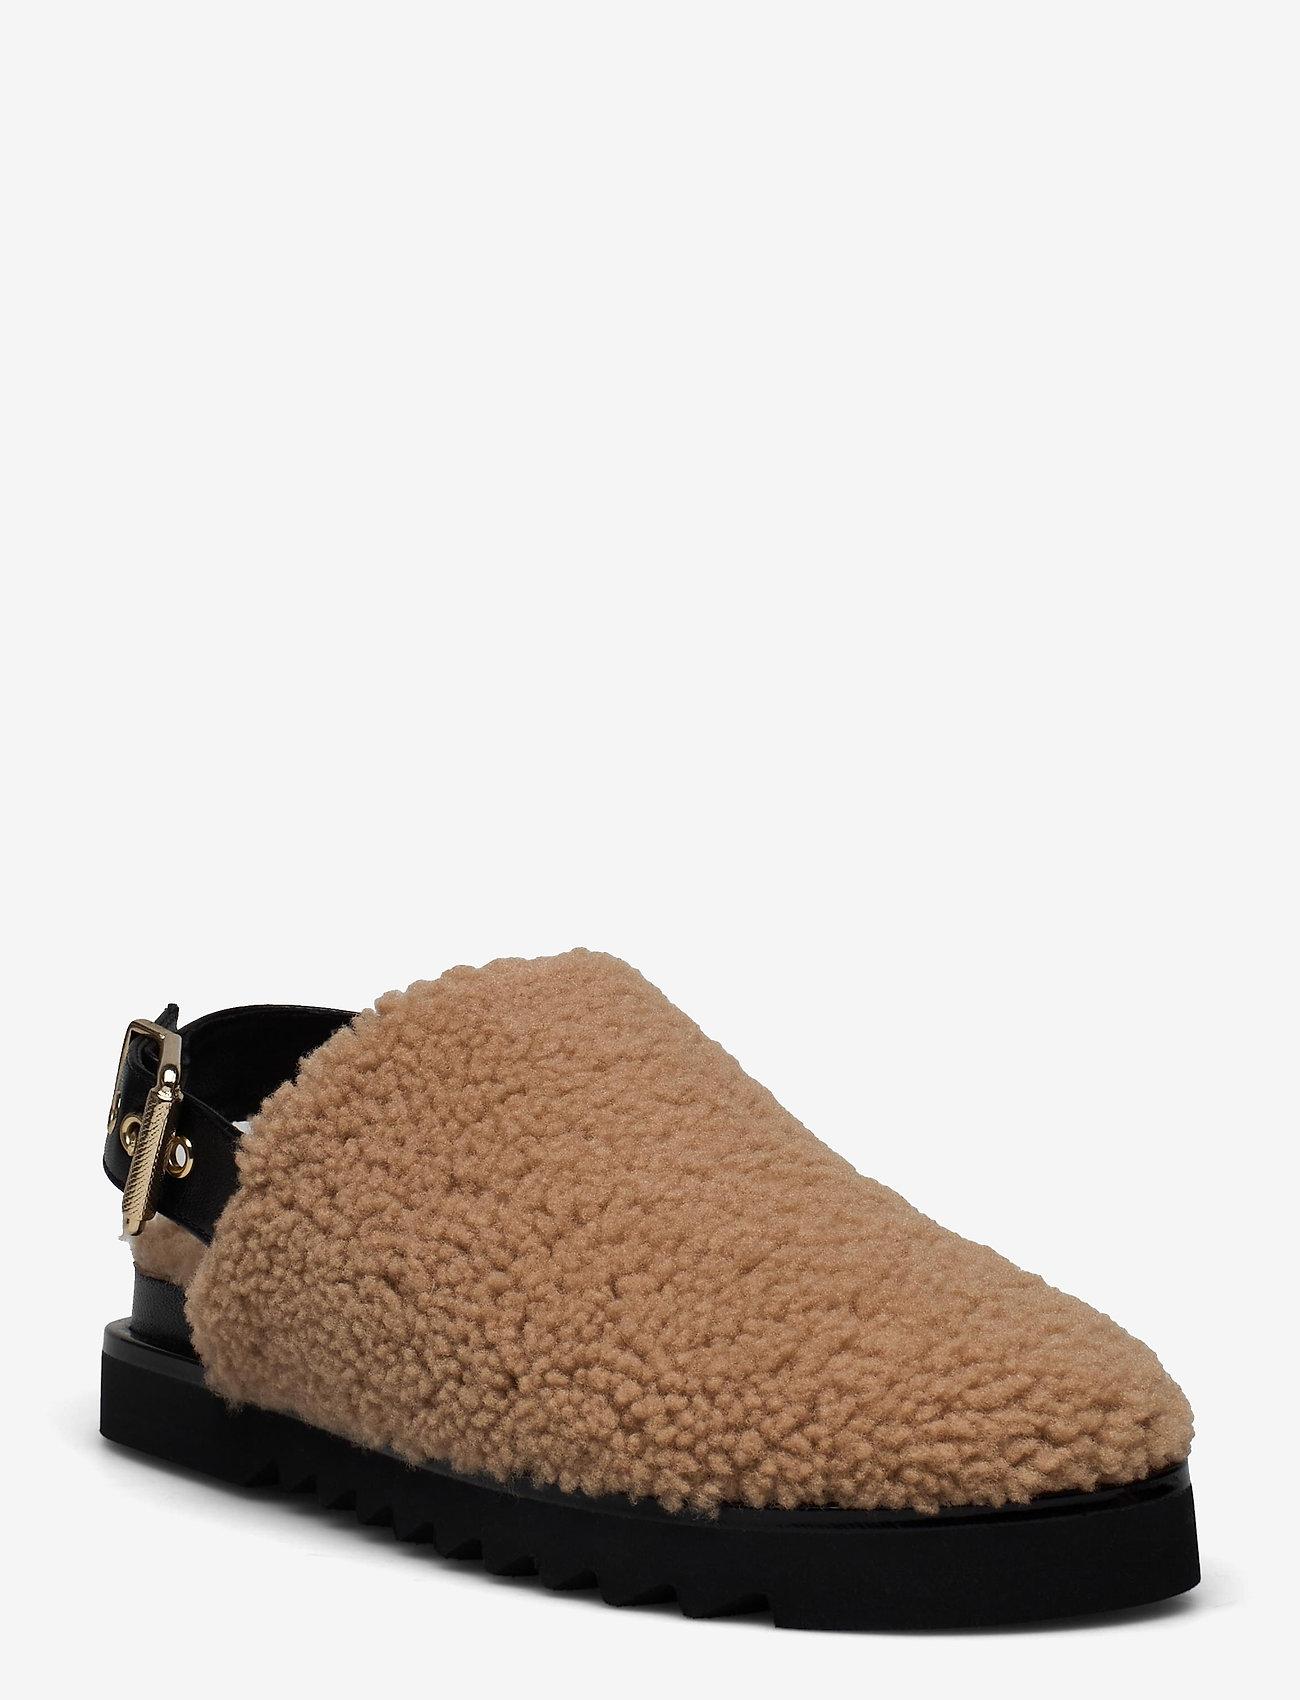 Billi Bi - Slipper  6070 - mules & slipins - nougat lamb/black sole 934 - 1